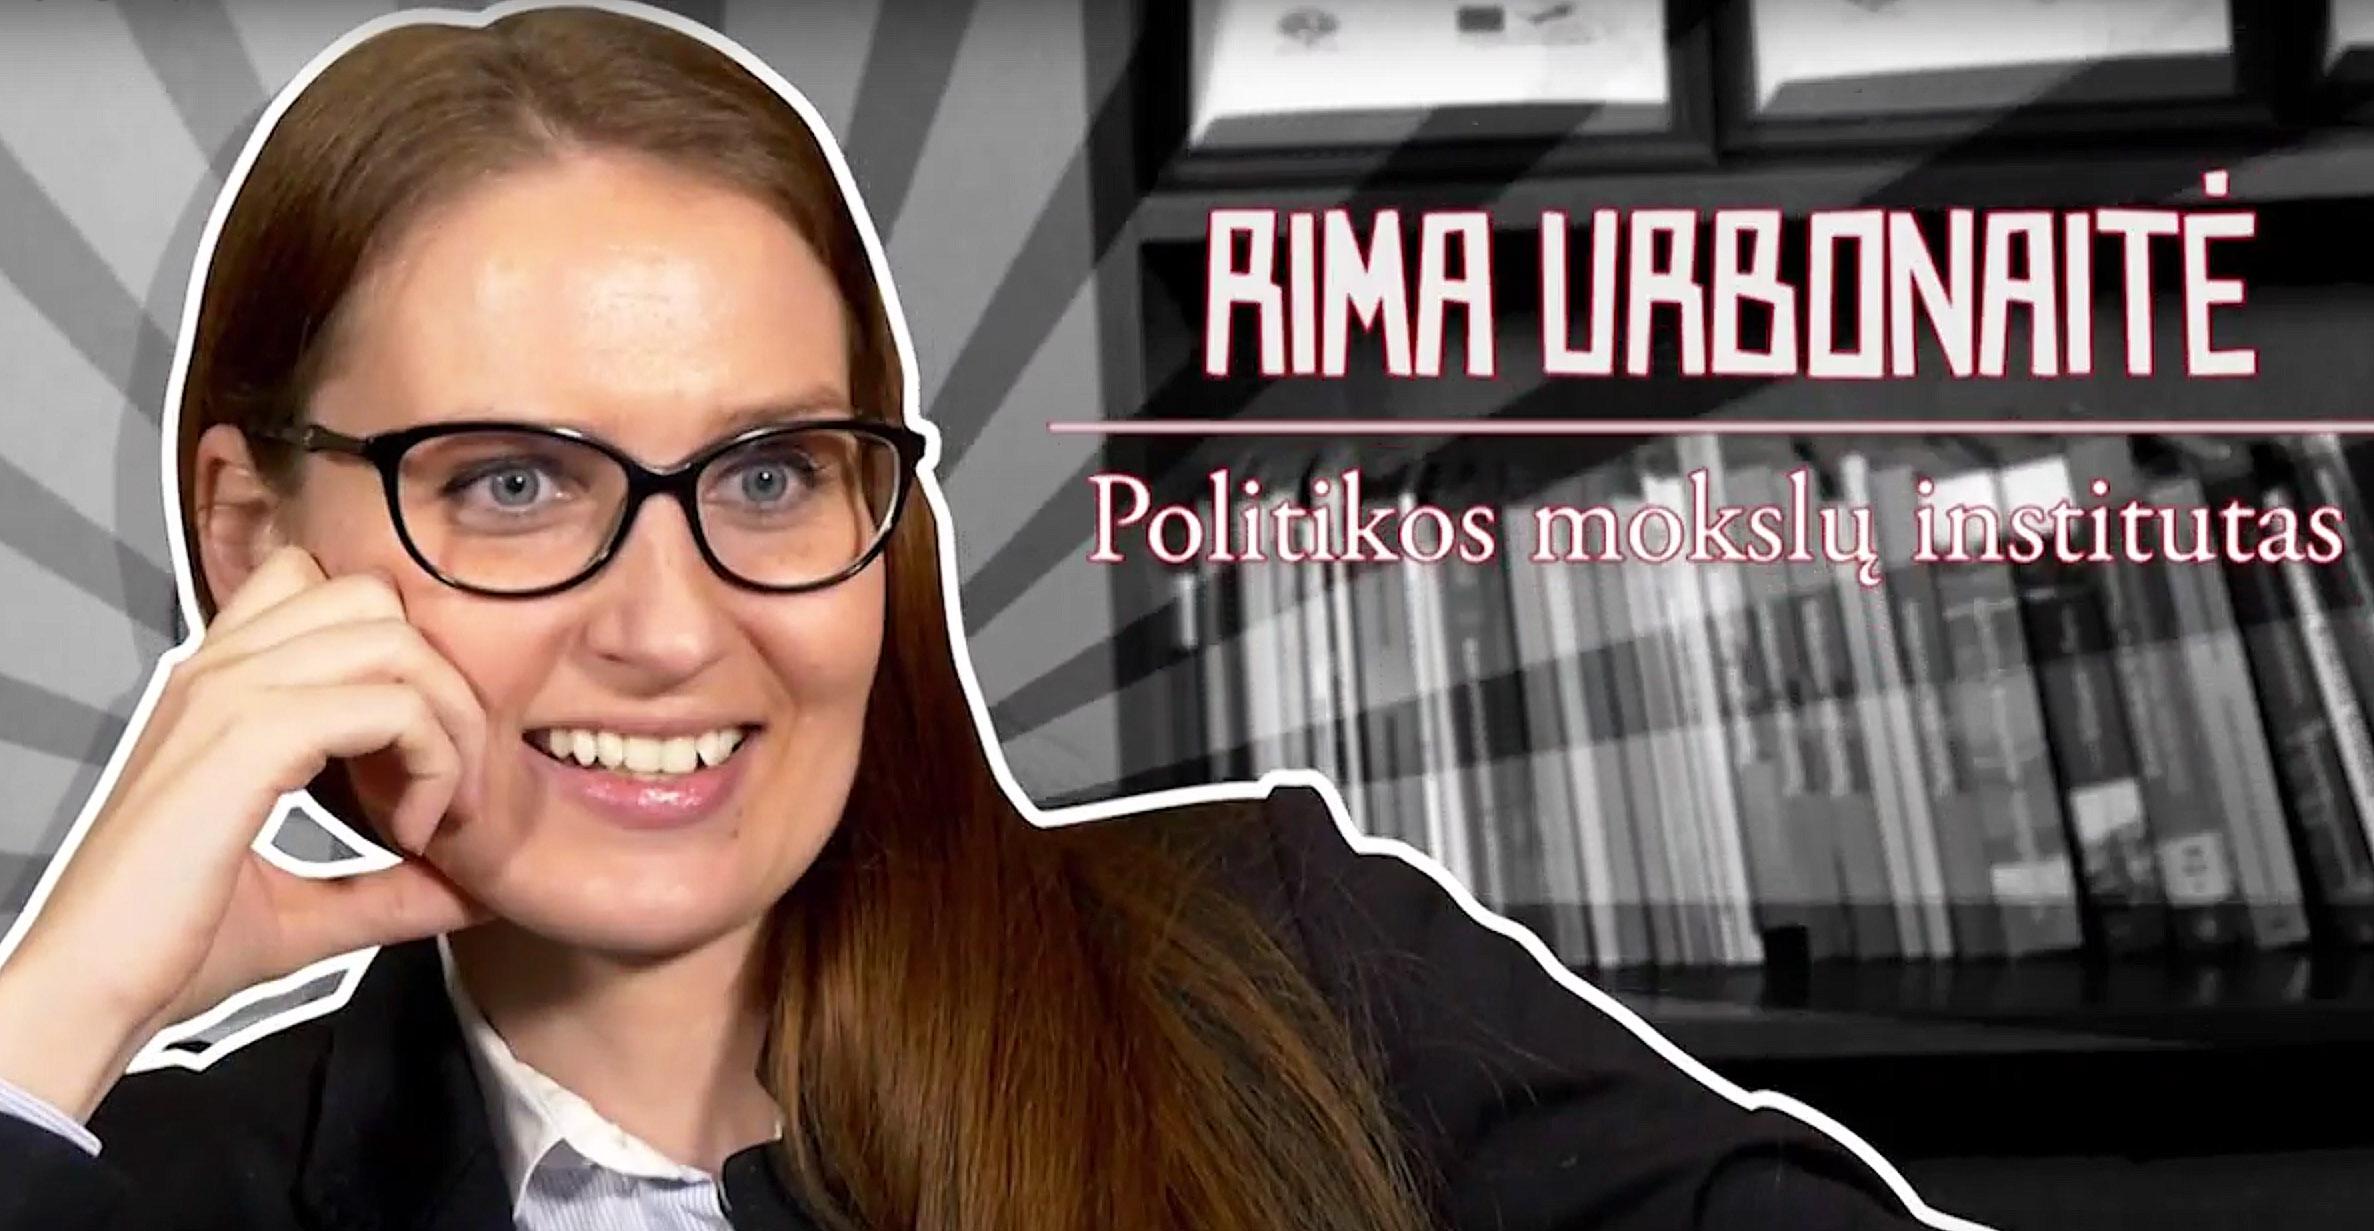 rima-urbonaite-youtube-com-stopkadras